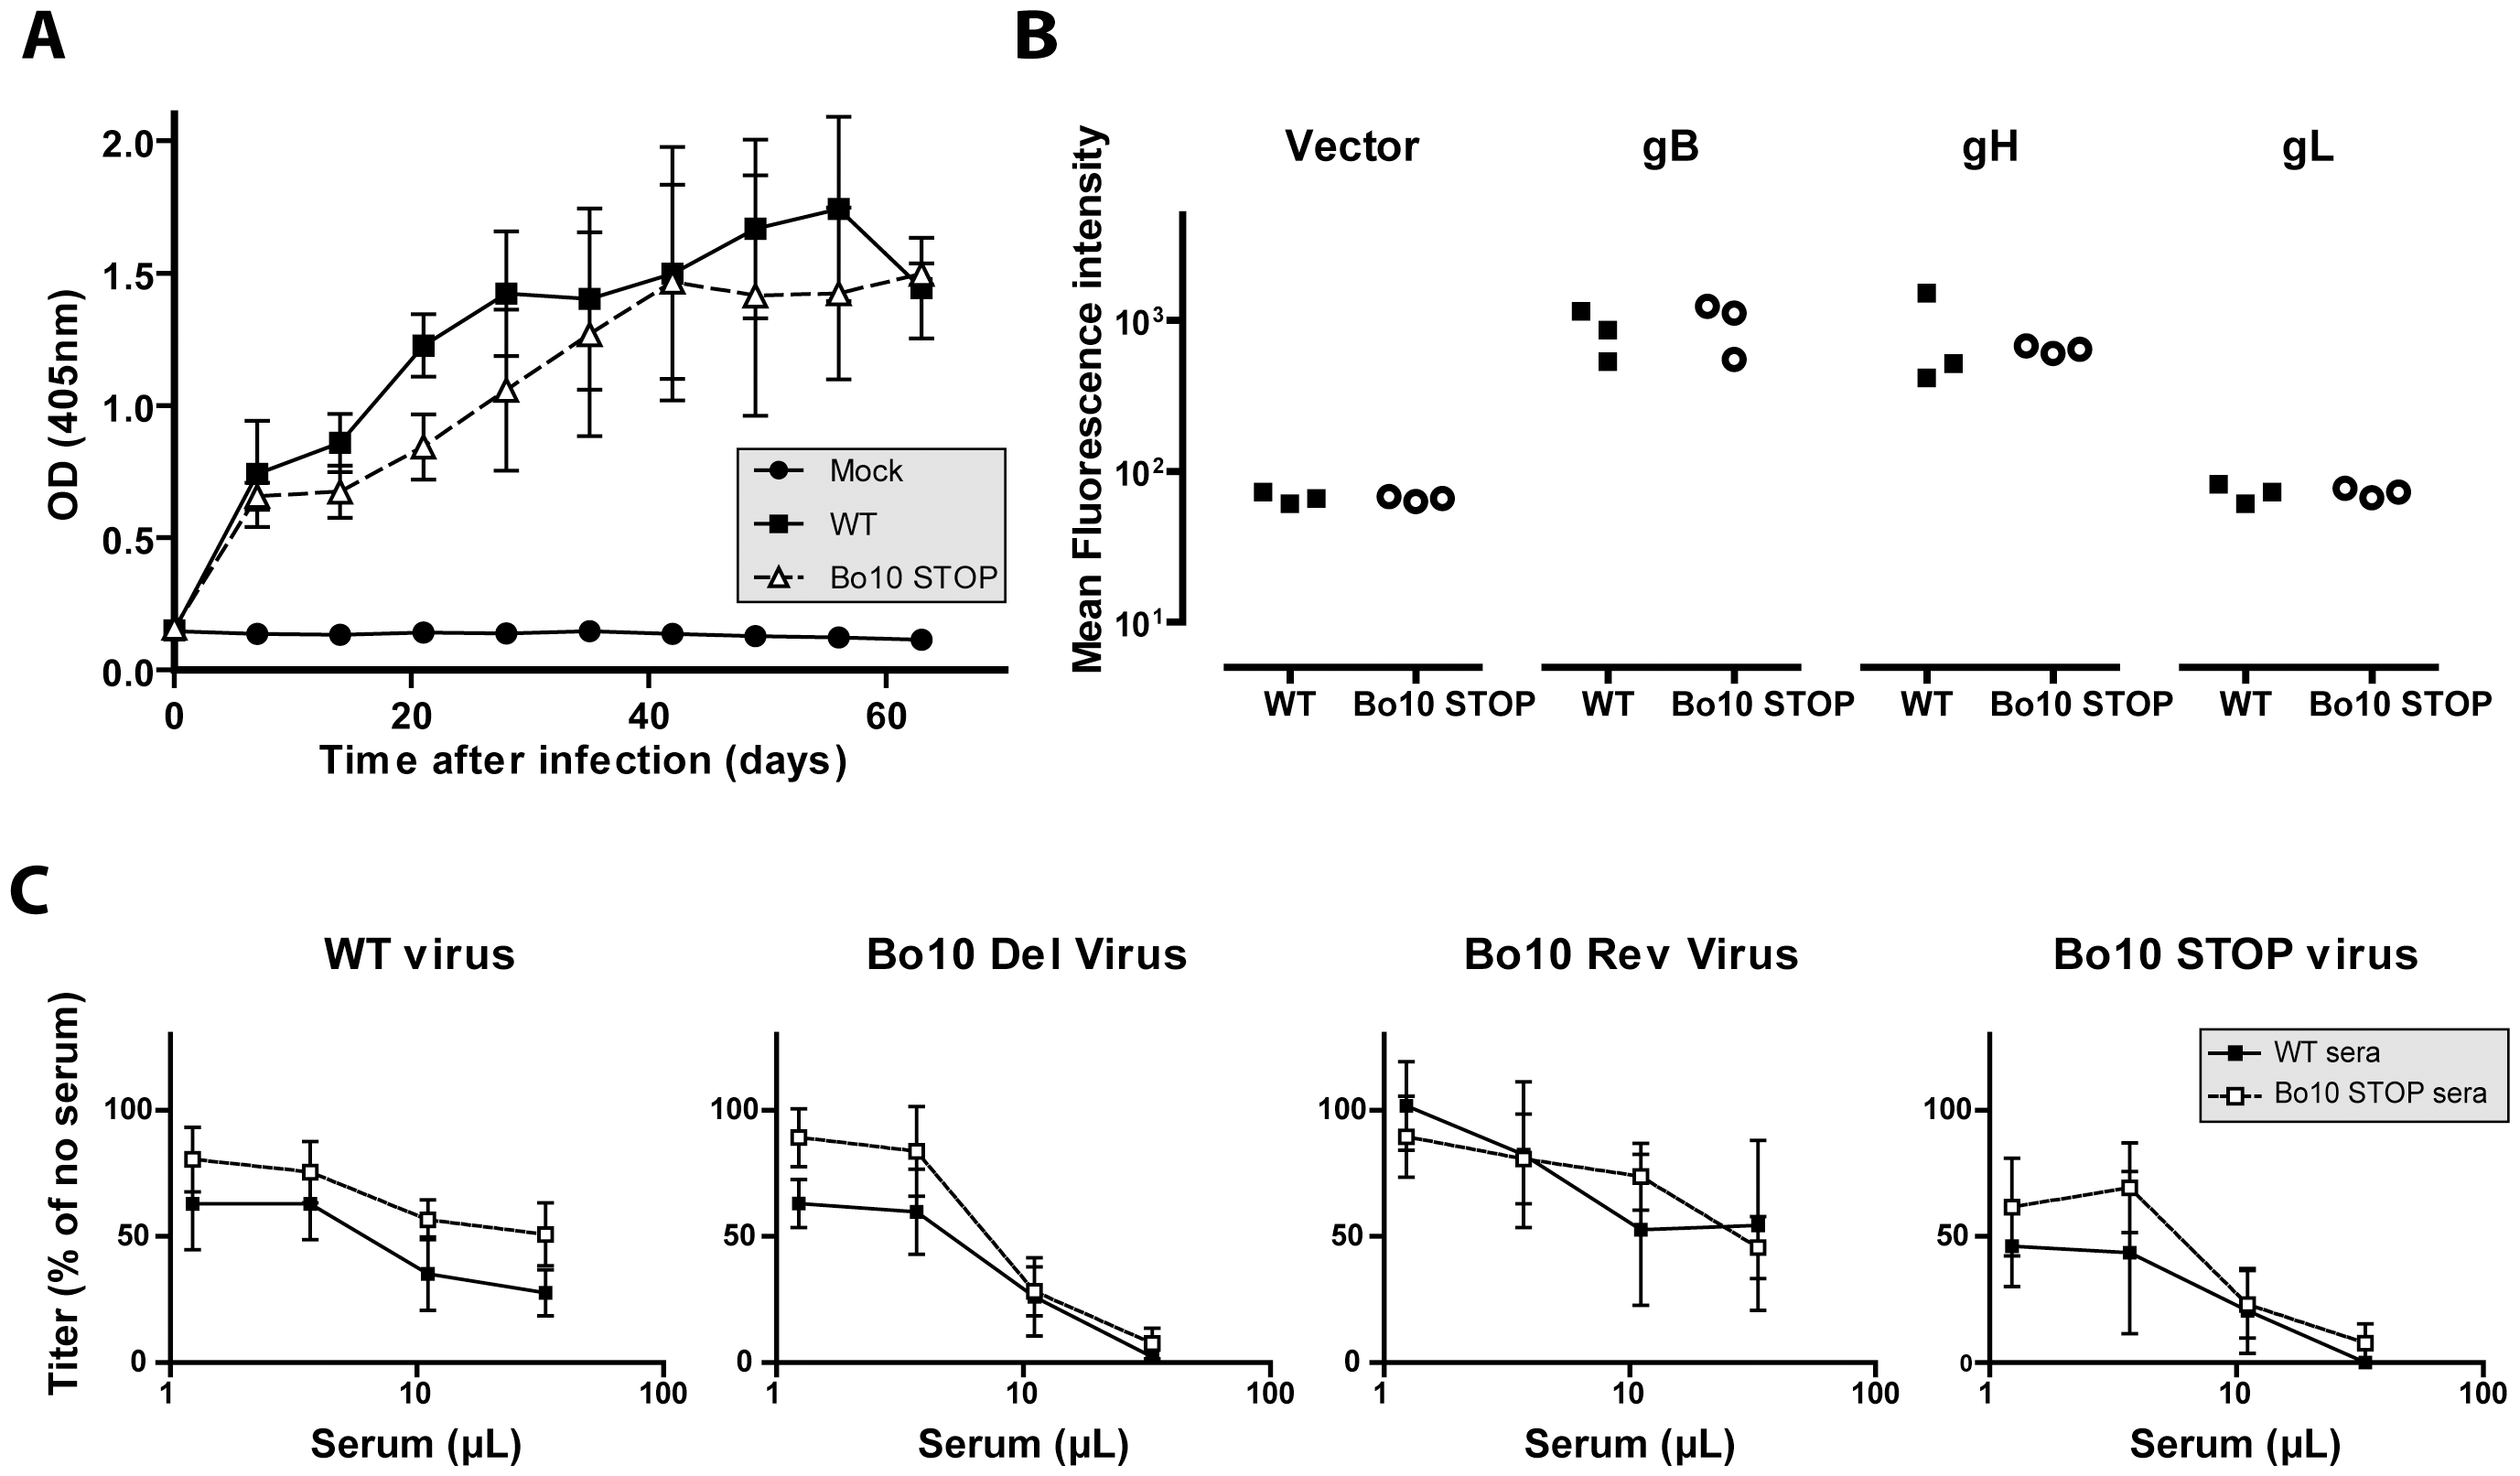 Immunogenicity of BoHV-4 lacking gp180.